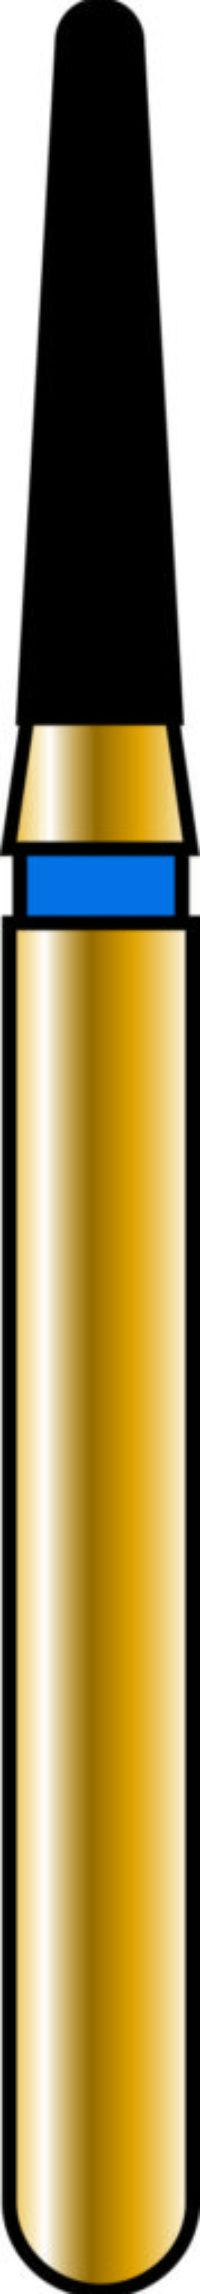 Round End Taper 14-6mm Gold Diamond Bur